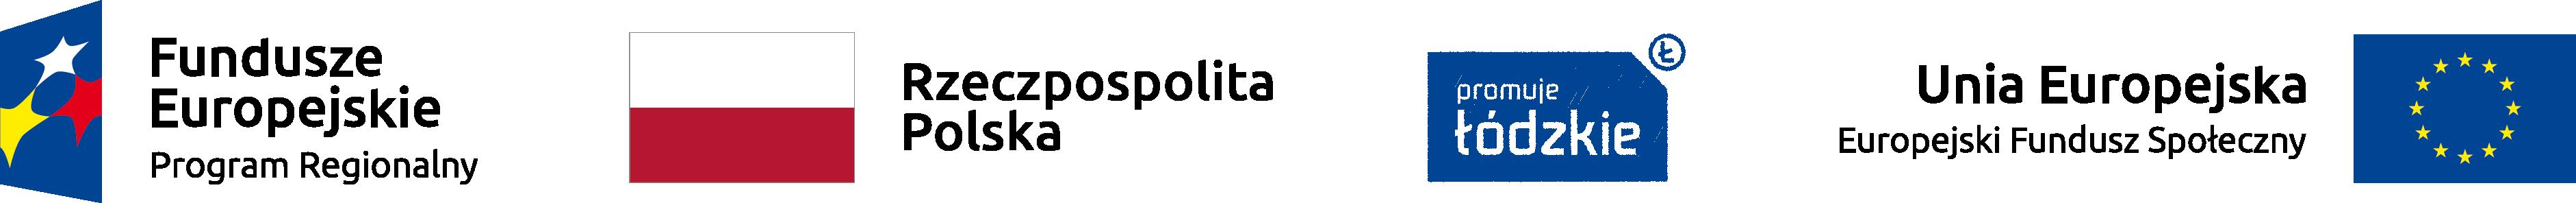 ciag-feprreg-rrp-lodz-ueefs-1